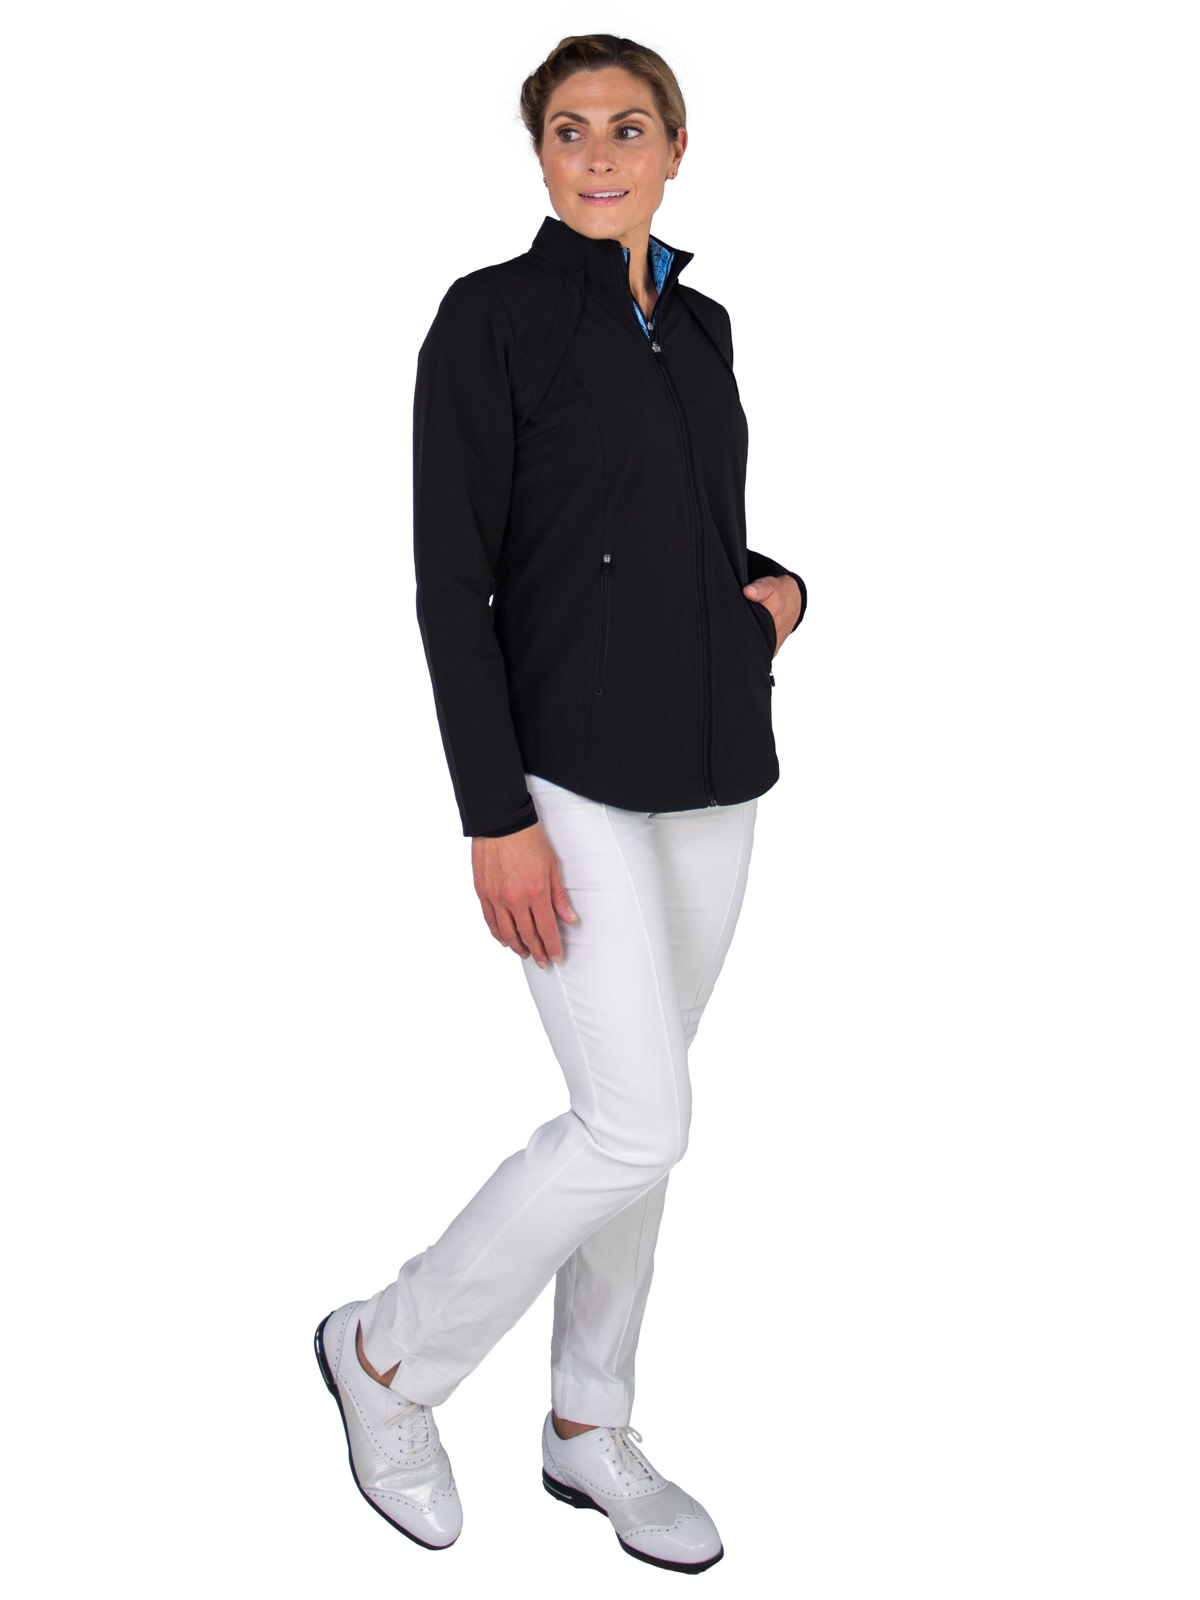 Jofit Wind Jacket w/ Removable Sleeves Black